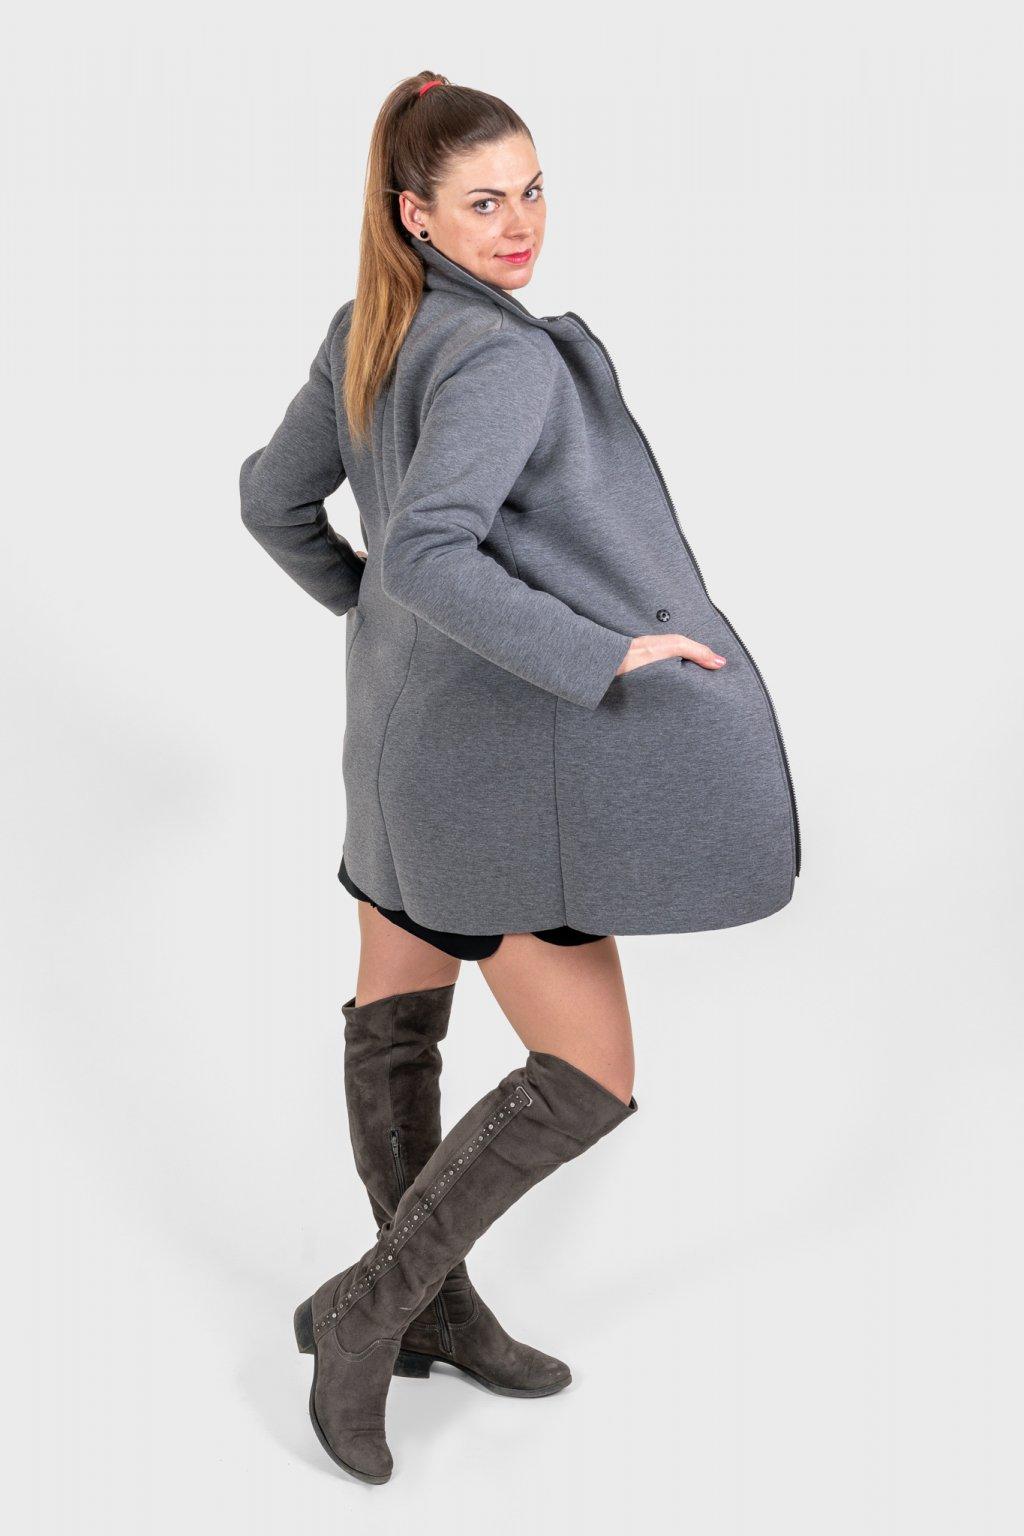 Dámský kabát slim grey šedý neopren s légou Goci